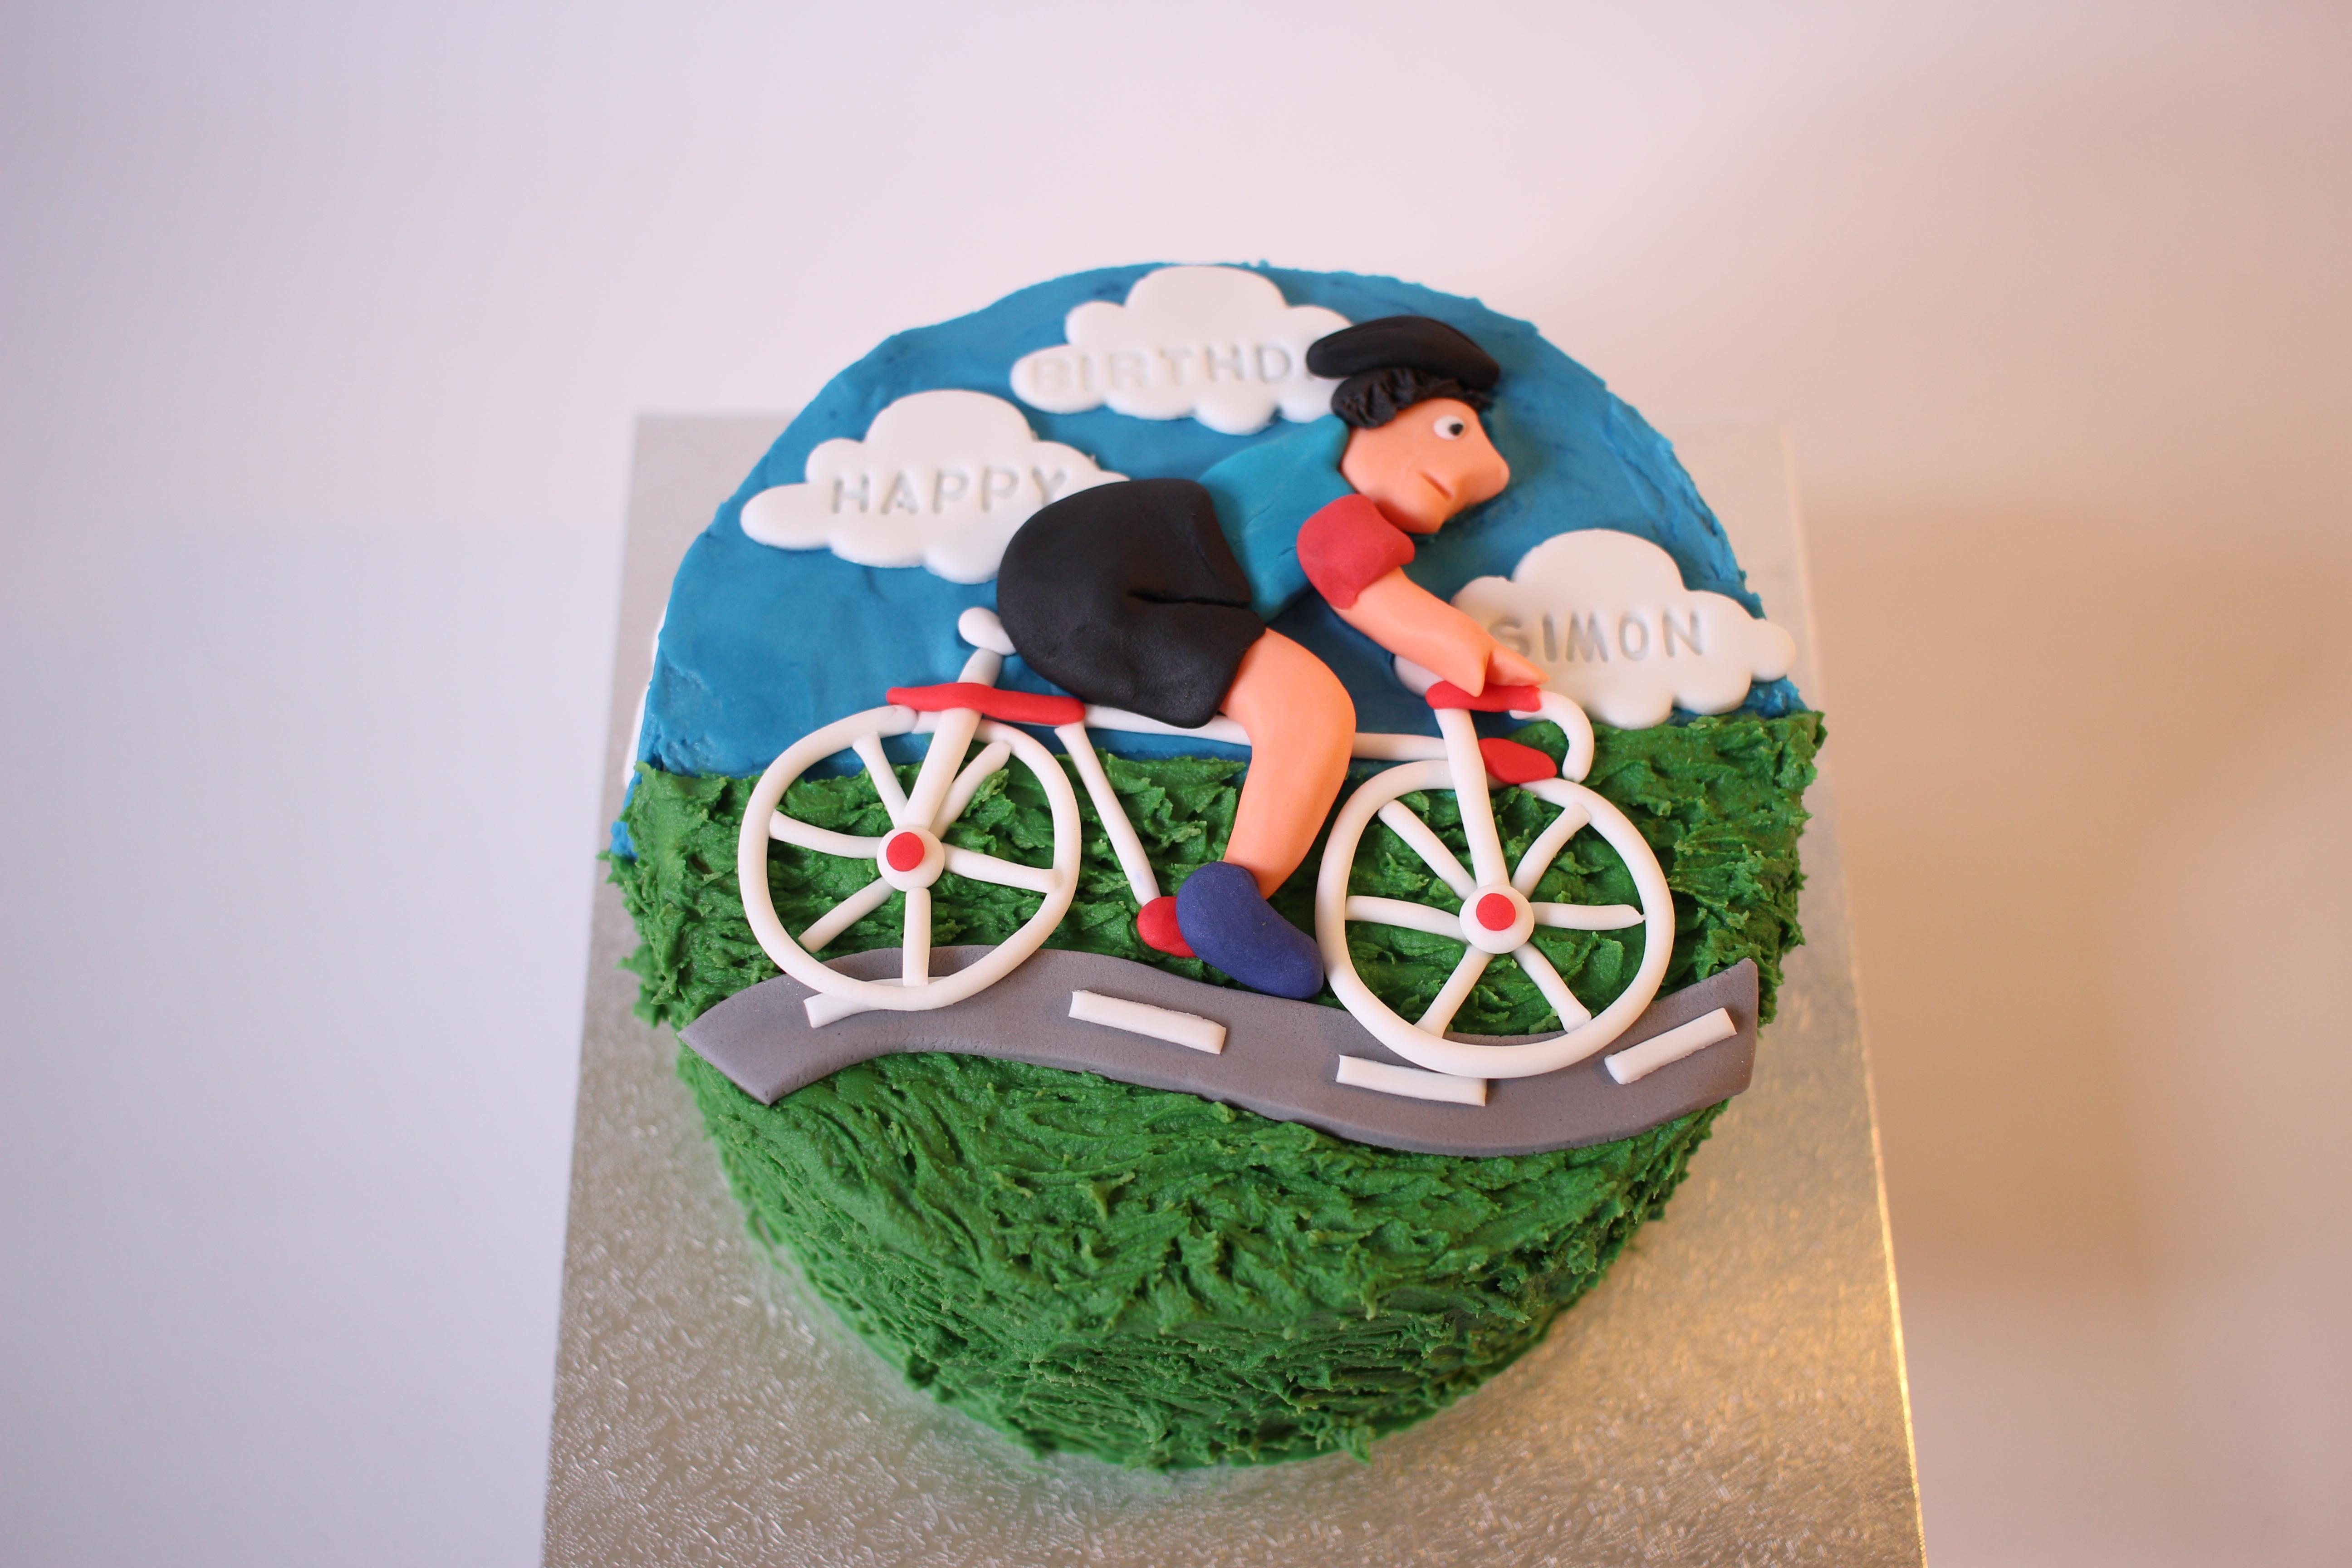 Cyclist on cake